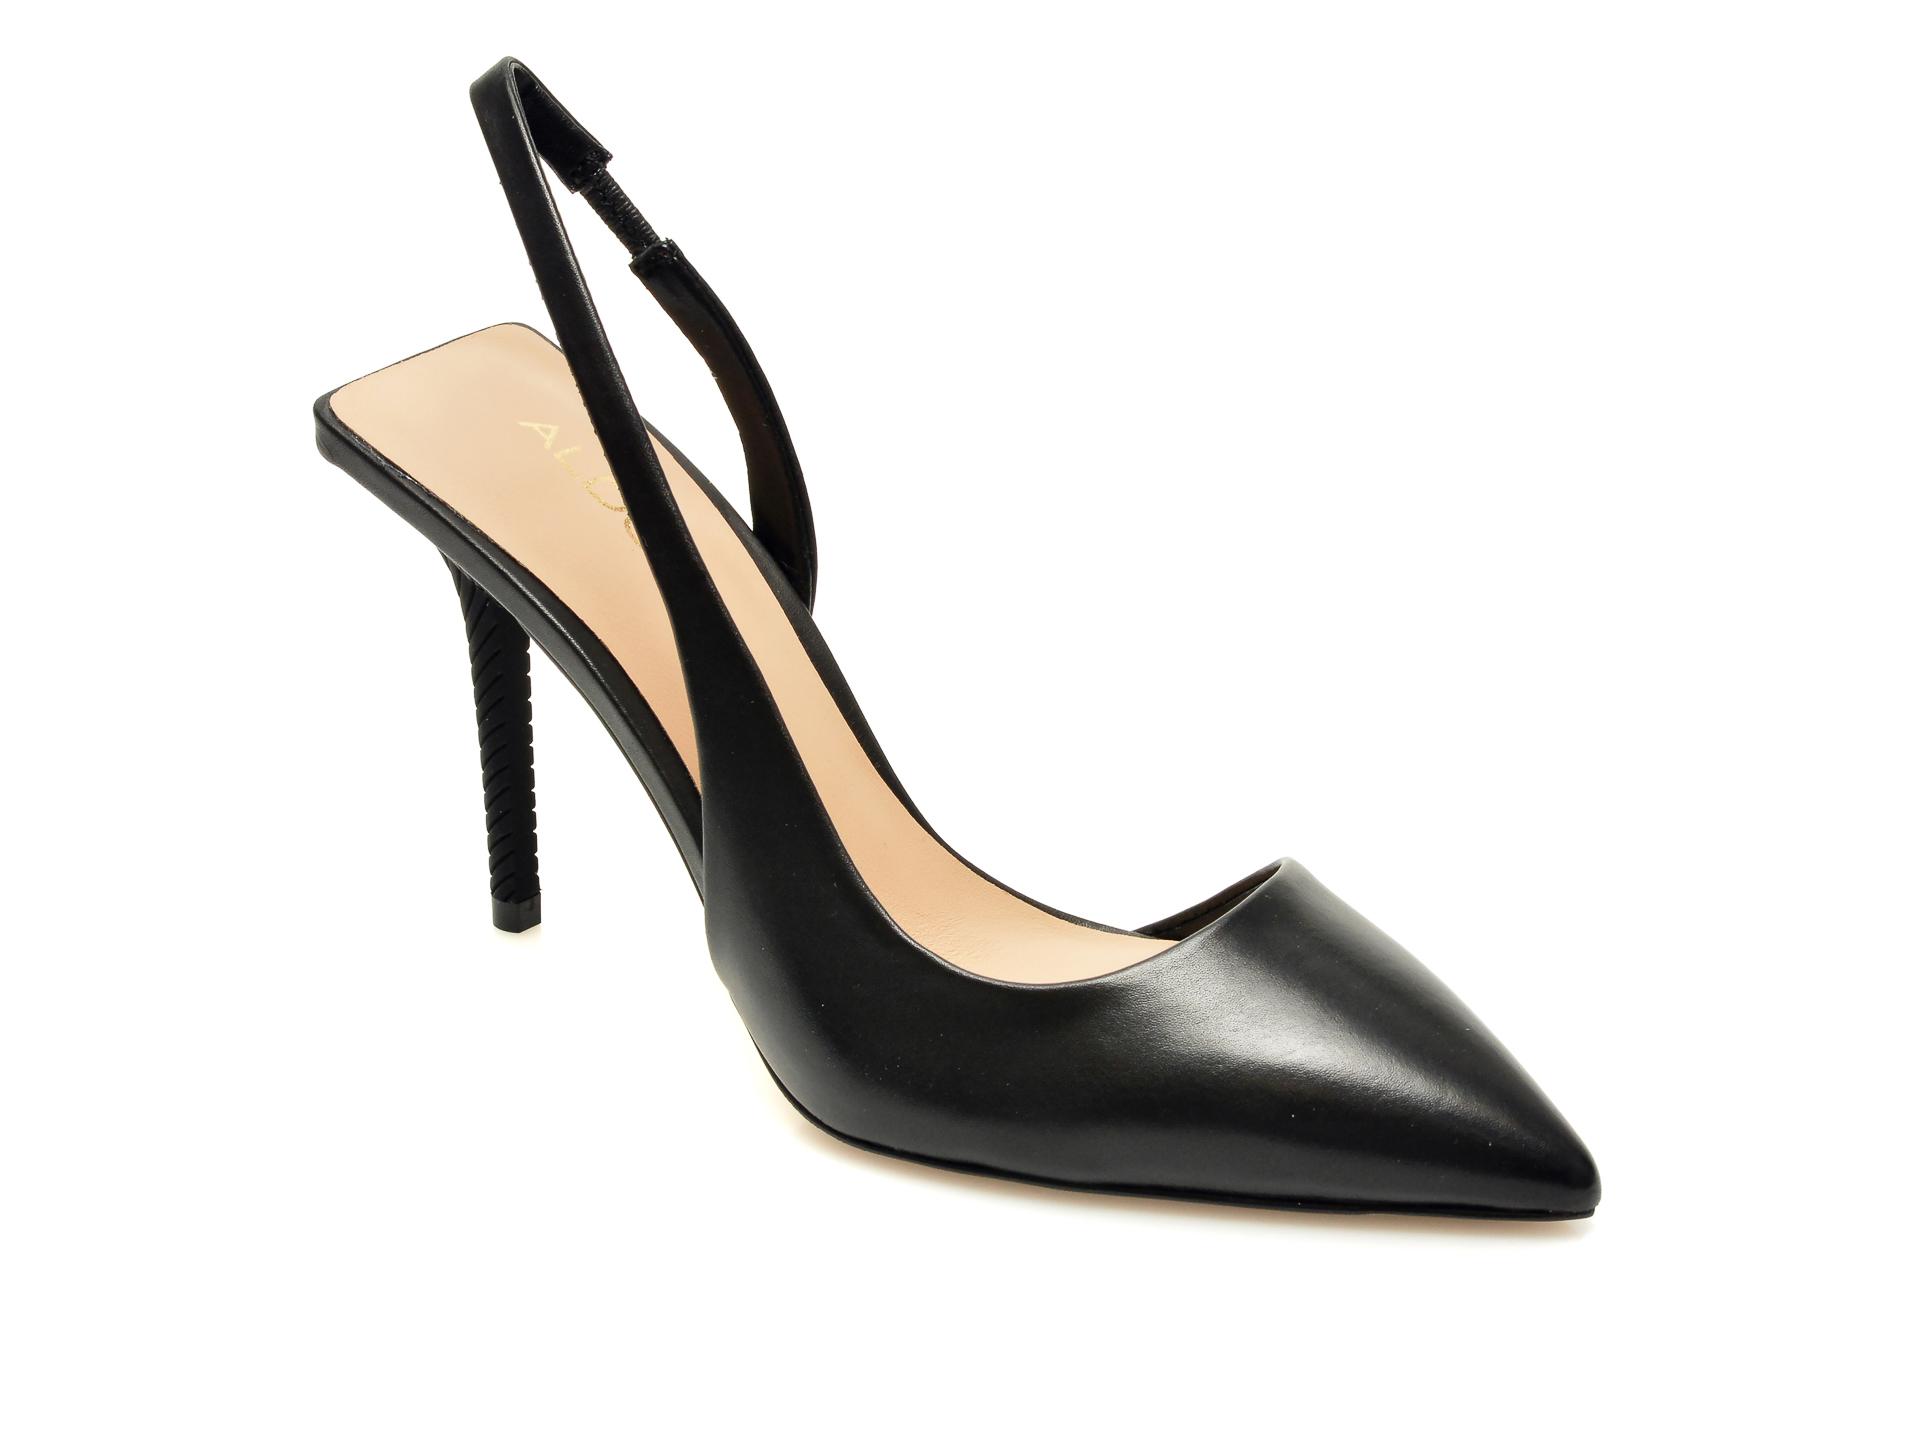 Pantofi ALDO negri, Tirarith001, din piele naturala imagine otter.ro 2021